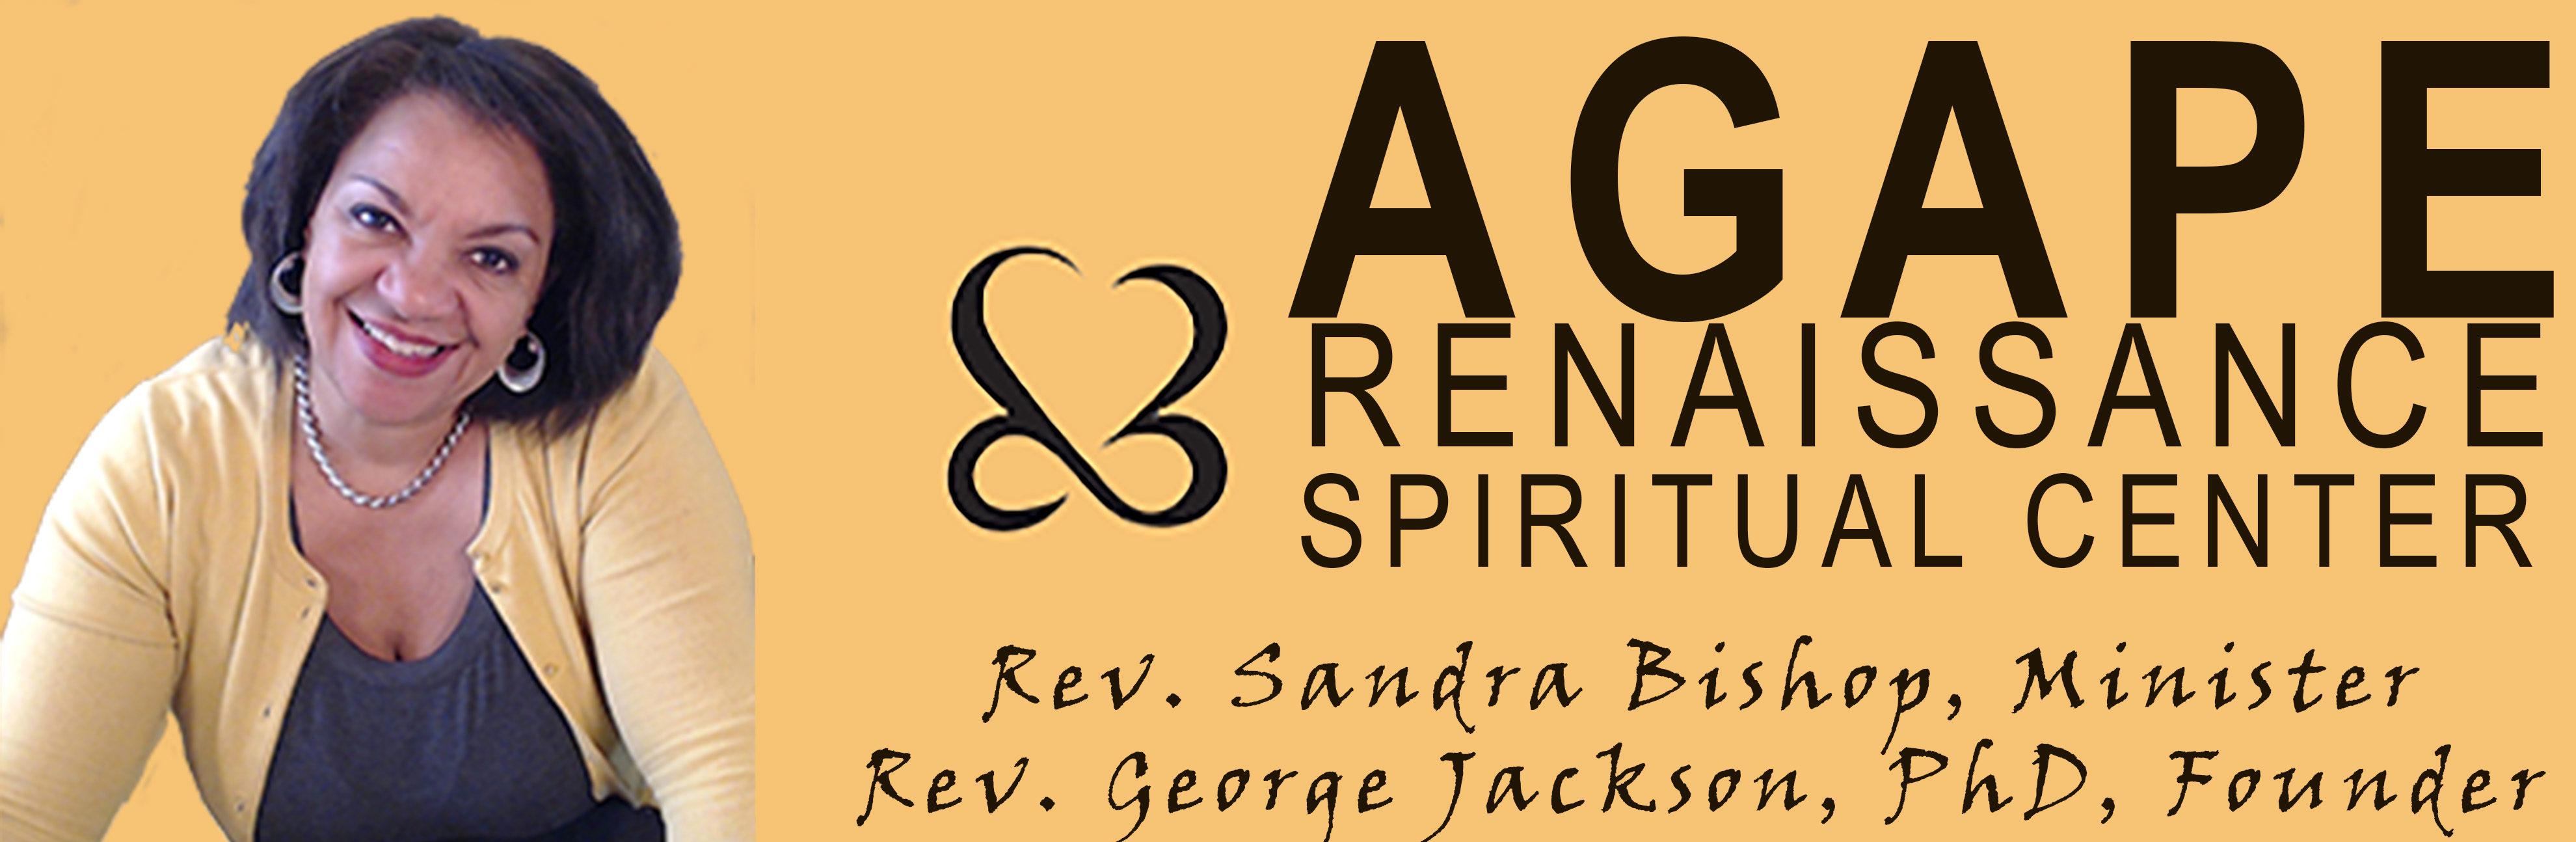 Agape Renaissance Spiritual Center